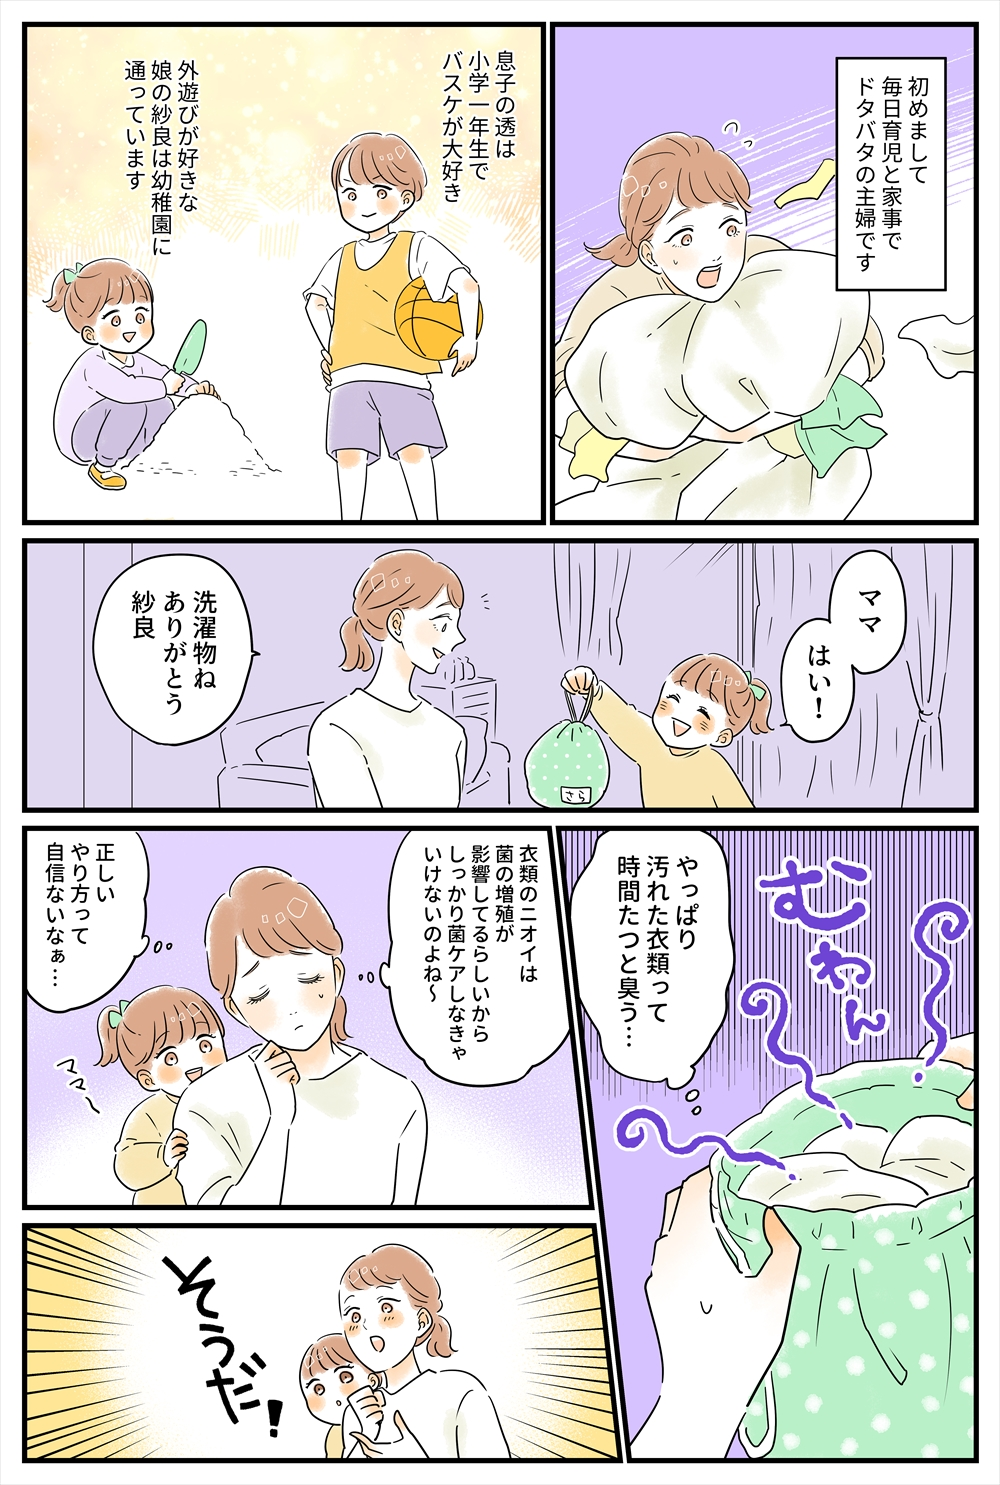 NANOXウェブ漫画-1P_r